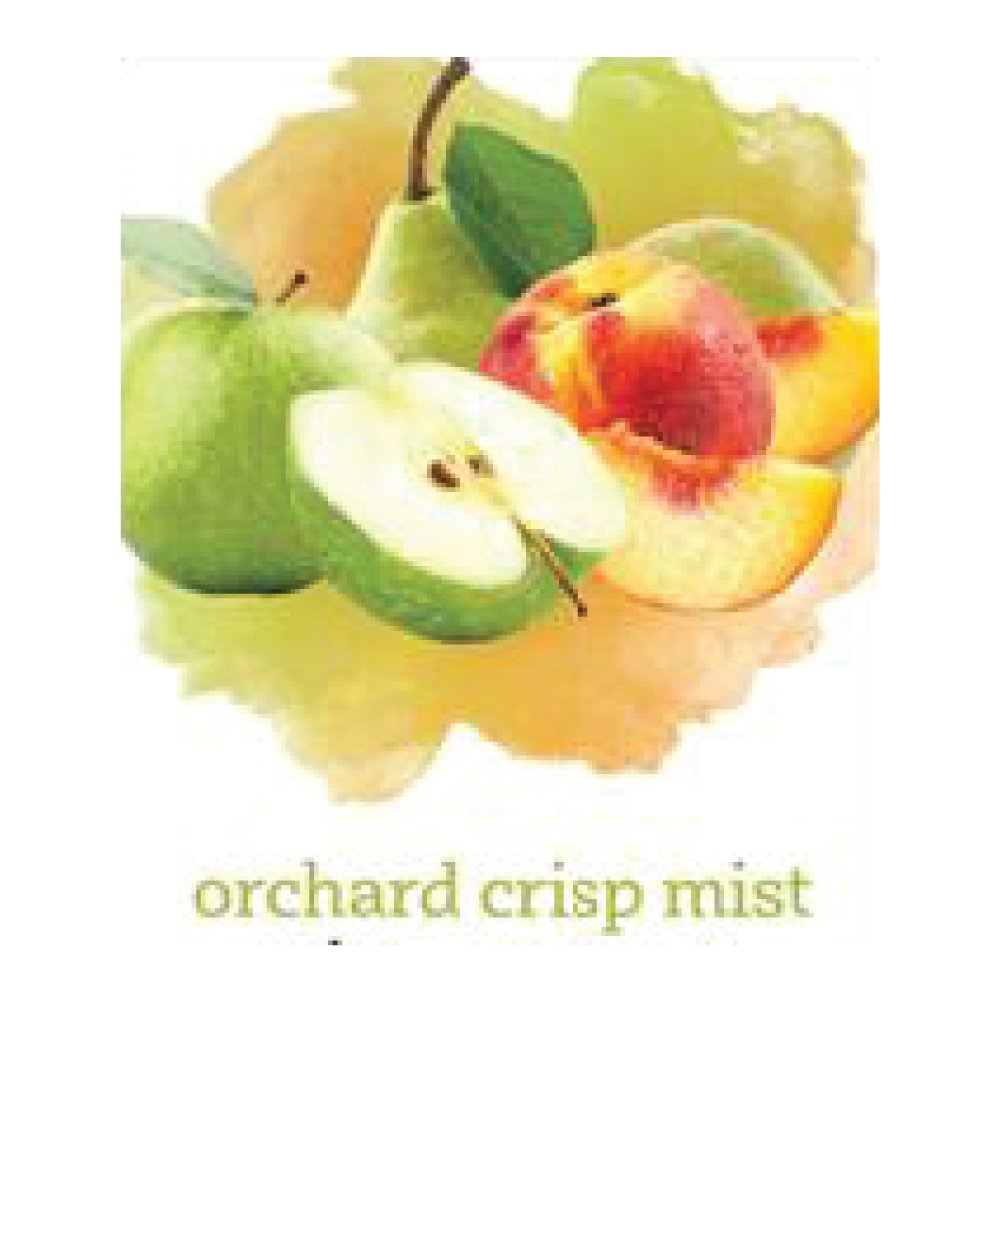 Niagara Mist Orchard Crisp Riesling Fruit Wine Kit Global Vintners Inc.TM